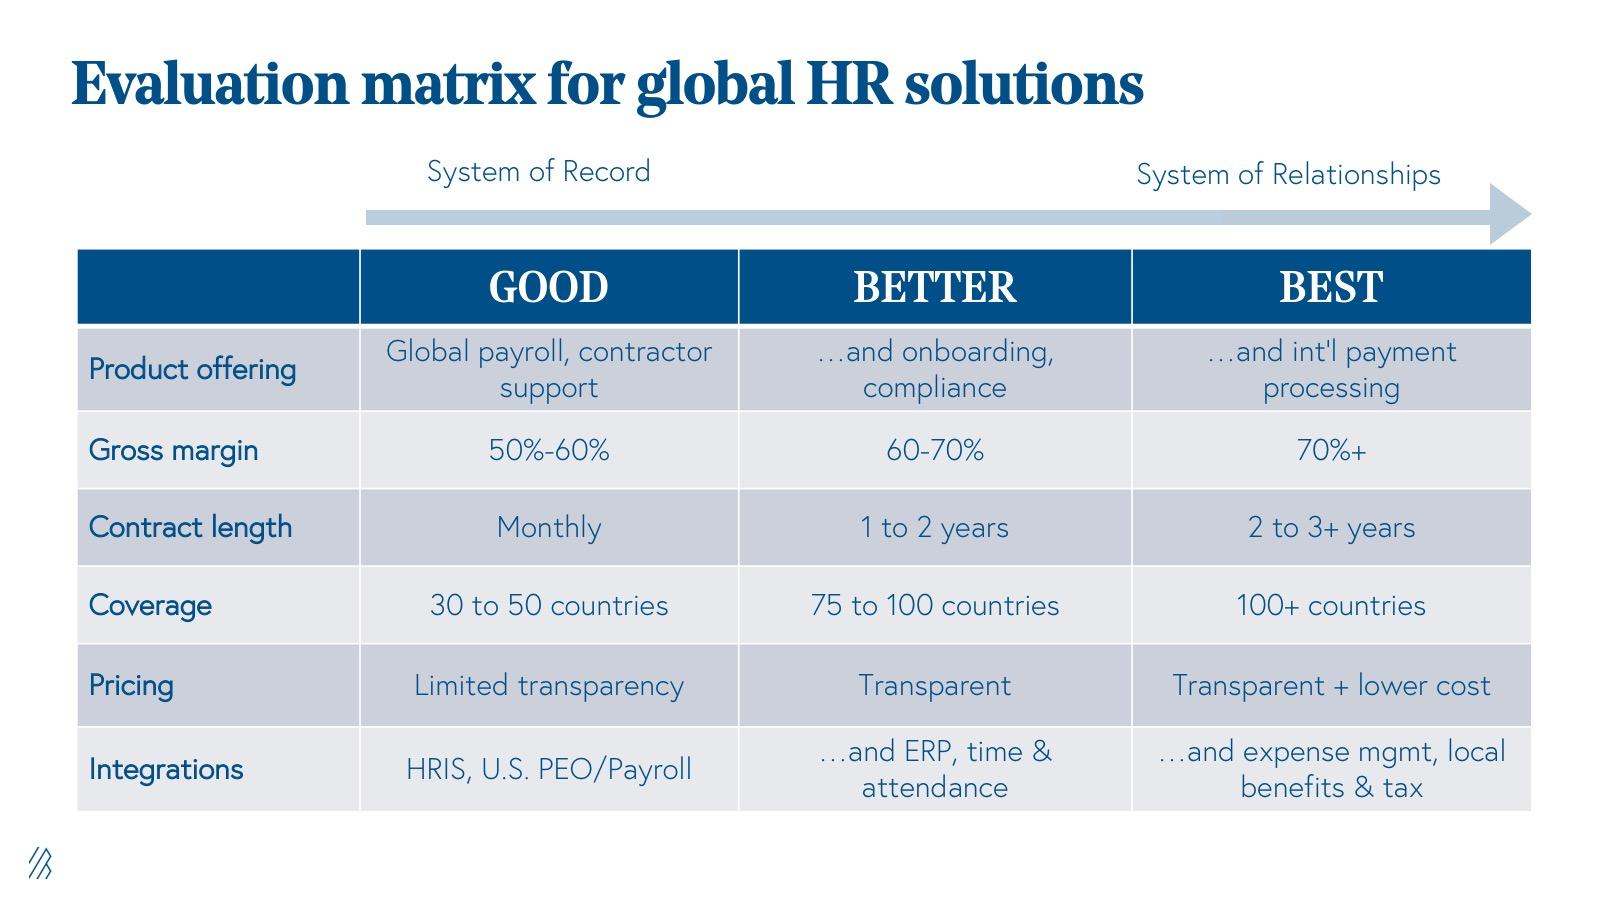 evaluation matrix for global HR solutions